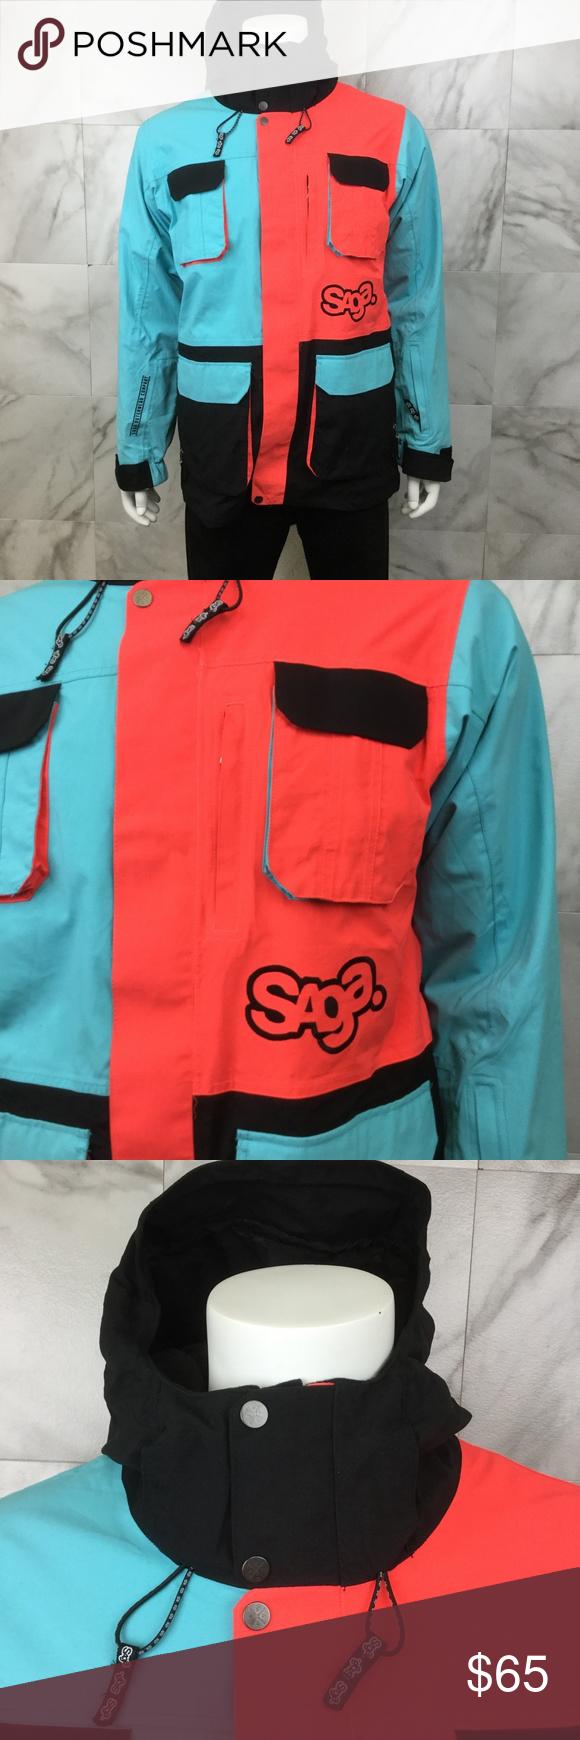 Saga Mens Colorblock Ski Coat Size M Saga Winter Ski Coat With Full Front Zipper And Velcro Anomie 2l Series Neon Colorblock Sty Fashion Ski Coat How To Wear [ 1740 x 580 Pixel ]